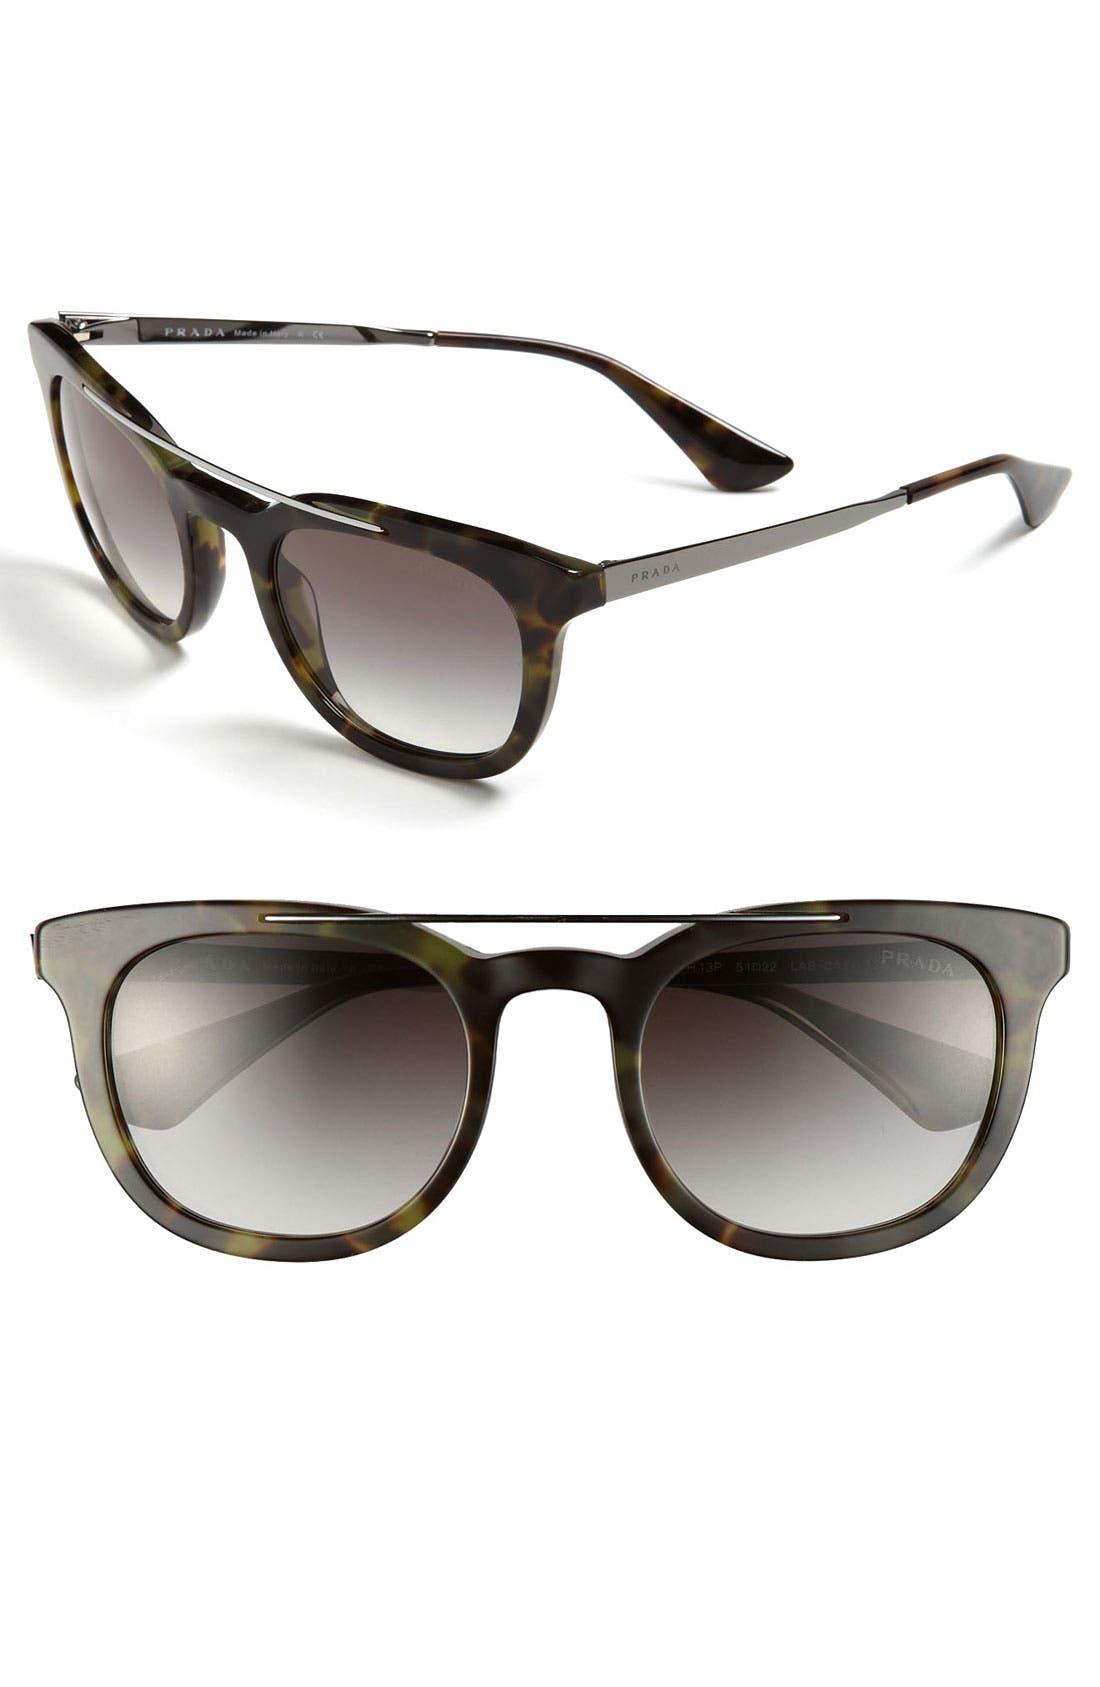 Alternate Image 1 Selected - Prada 'Fashion Browbar' 51mm Sunglasses